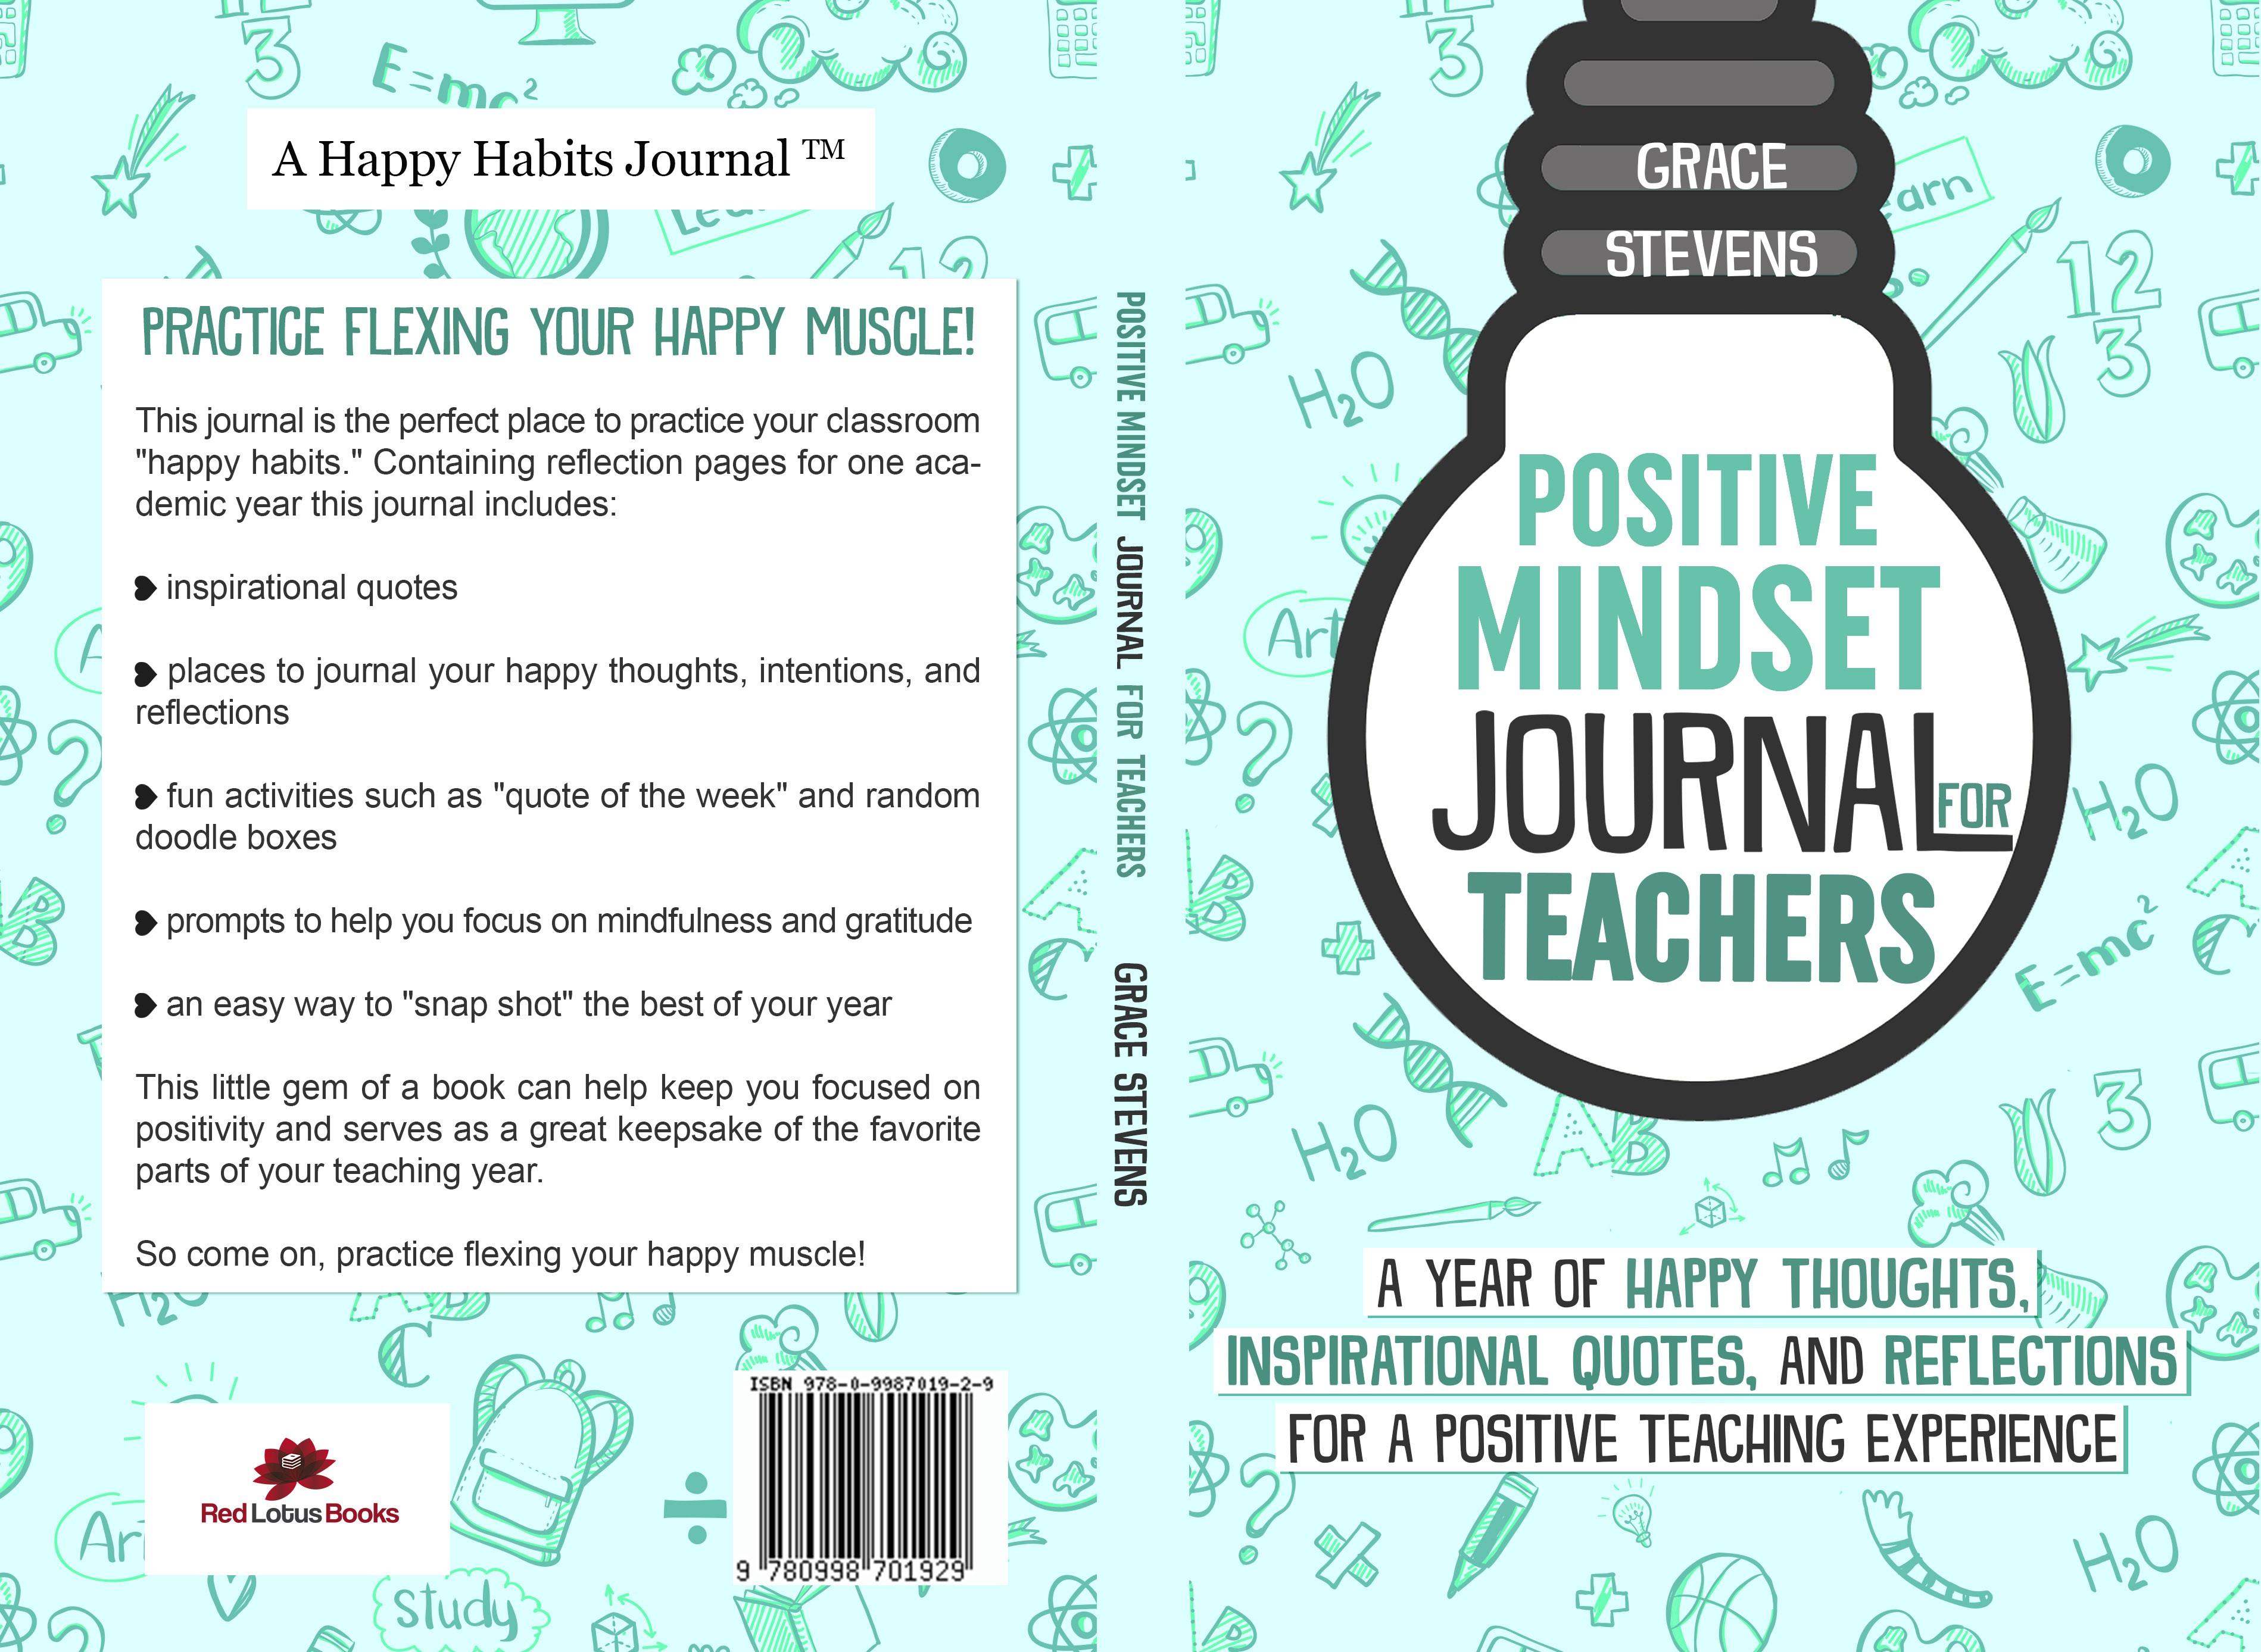 Design a cover for a positivity journal for teachers